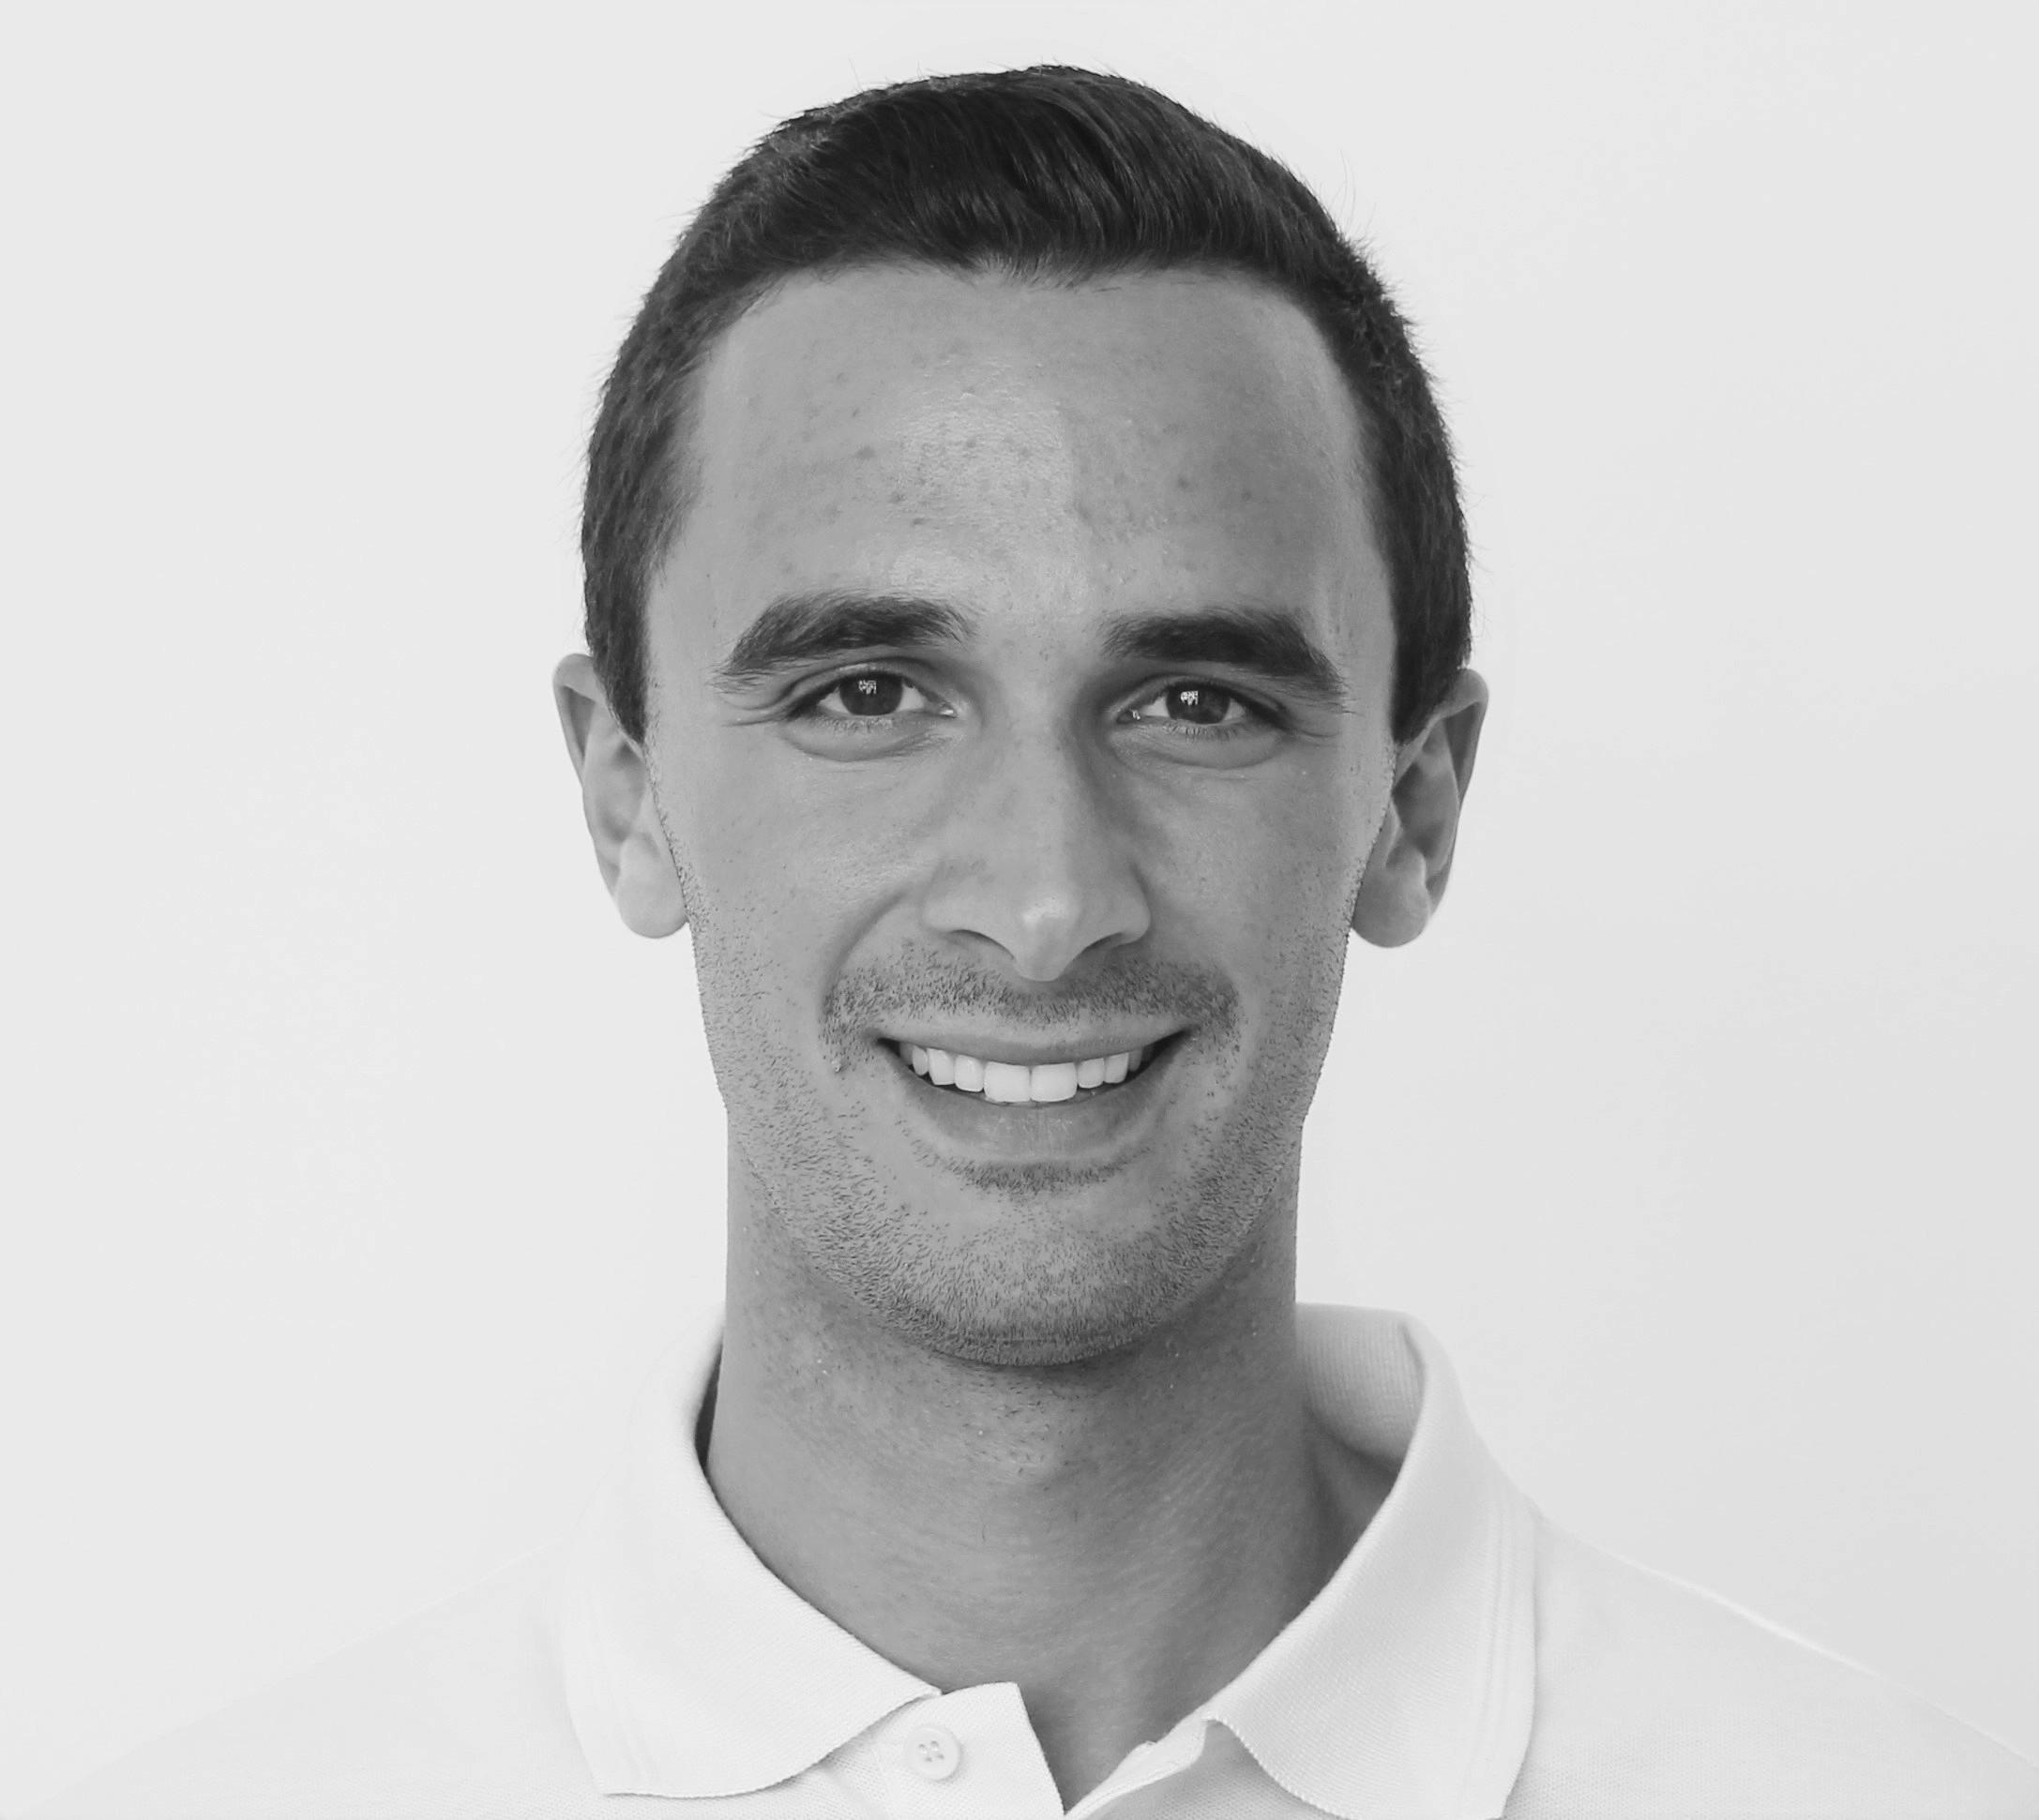 Personal Trainer Daniel Soares